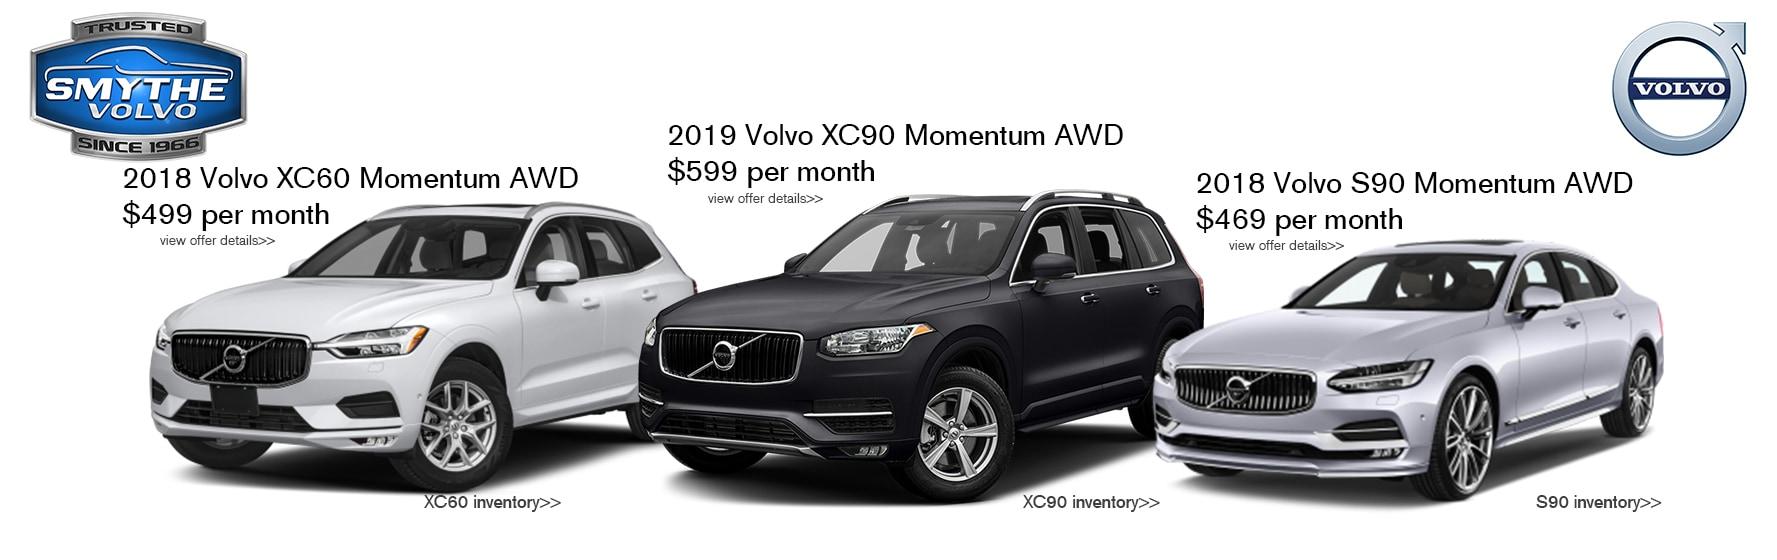 New & Pre-Owned Volvo Dealer in Summit, NJ | Smythe Volvo